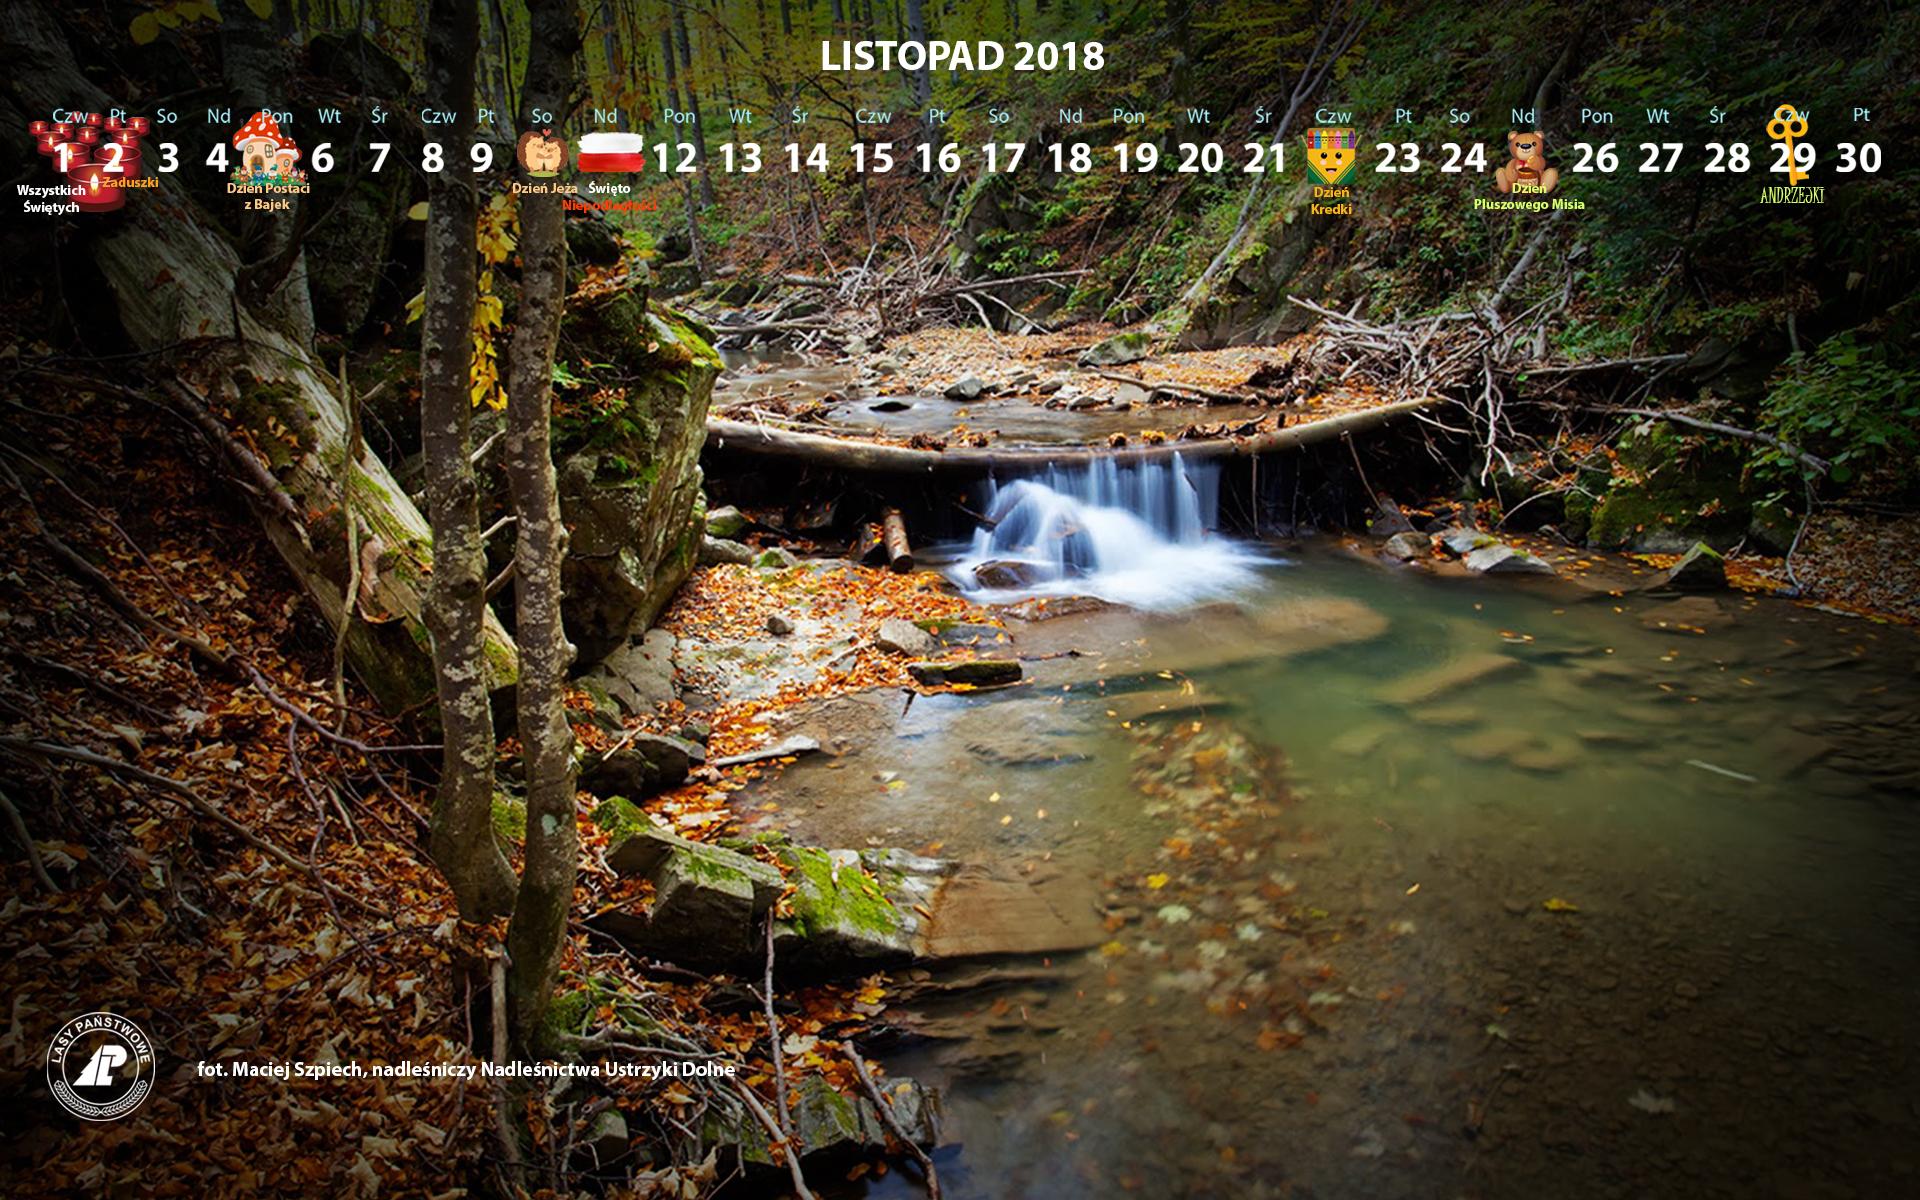 Kalendarz_listopad_2018_1920x1200[1].jpg